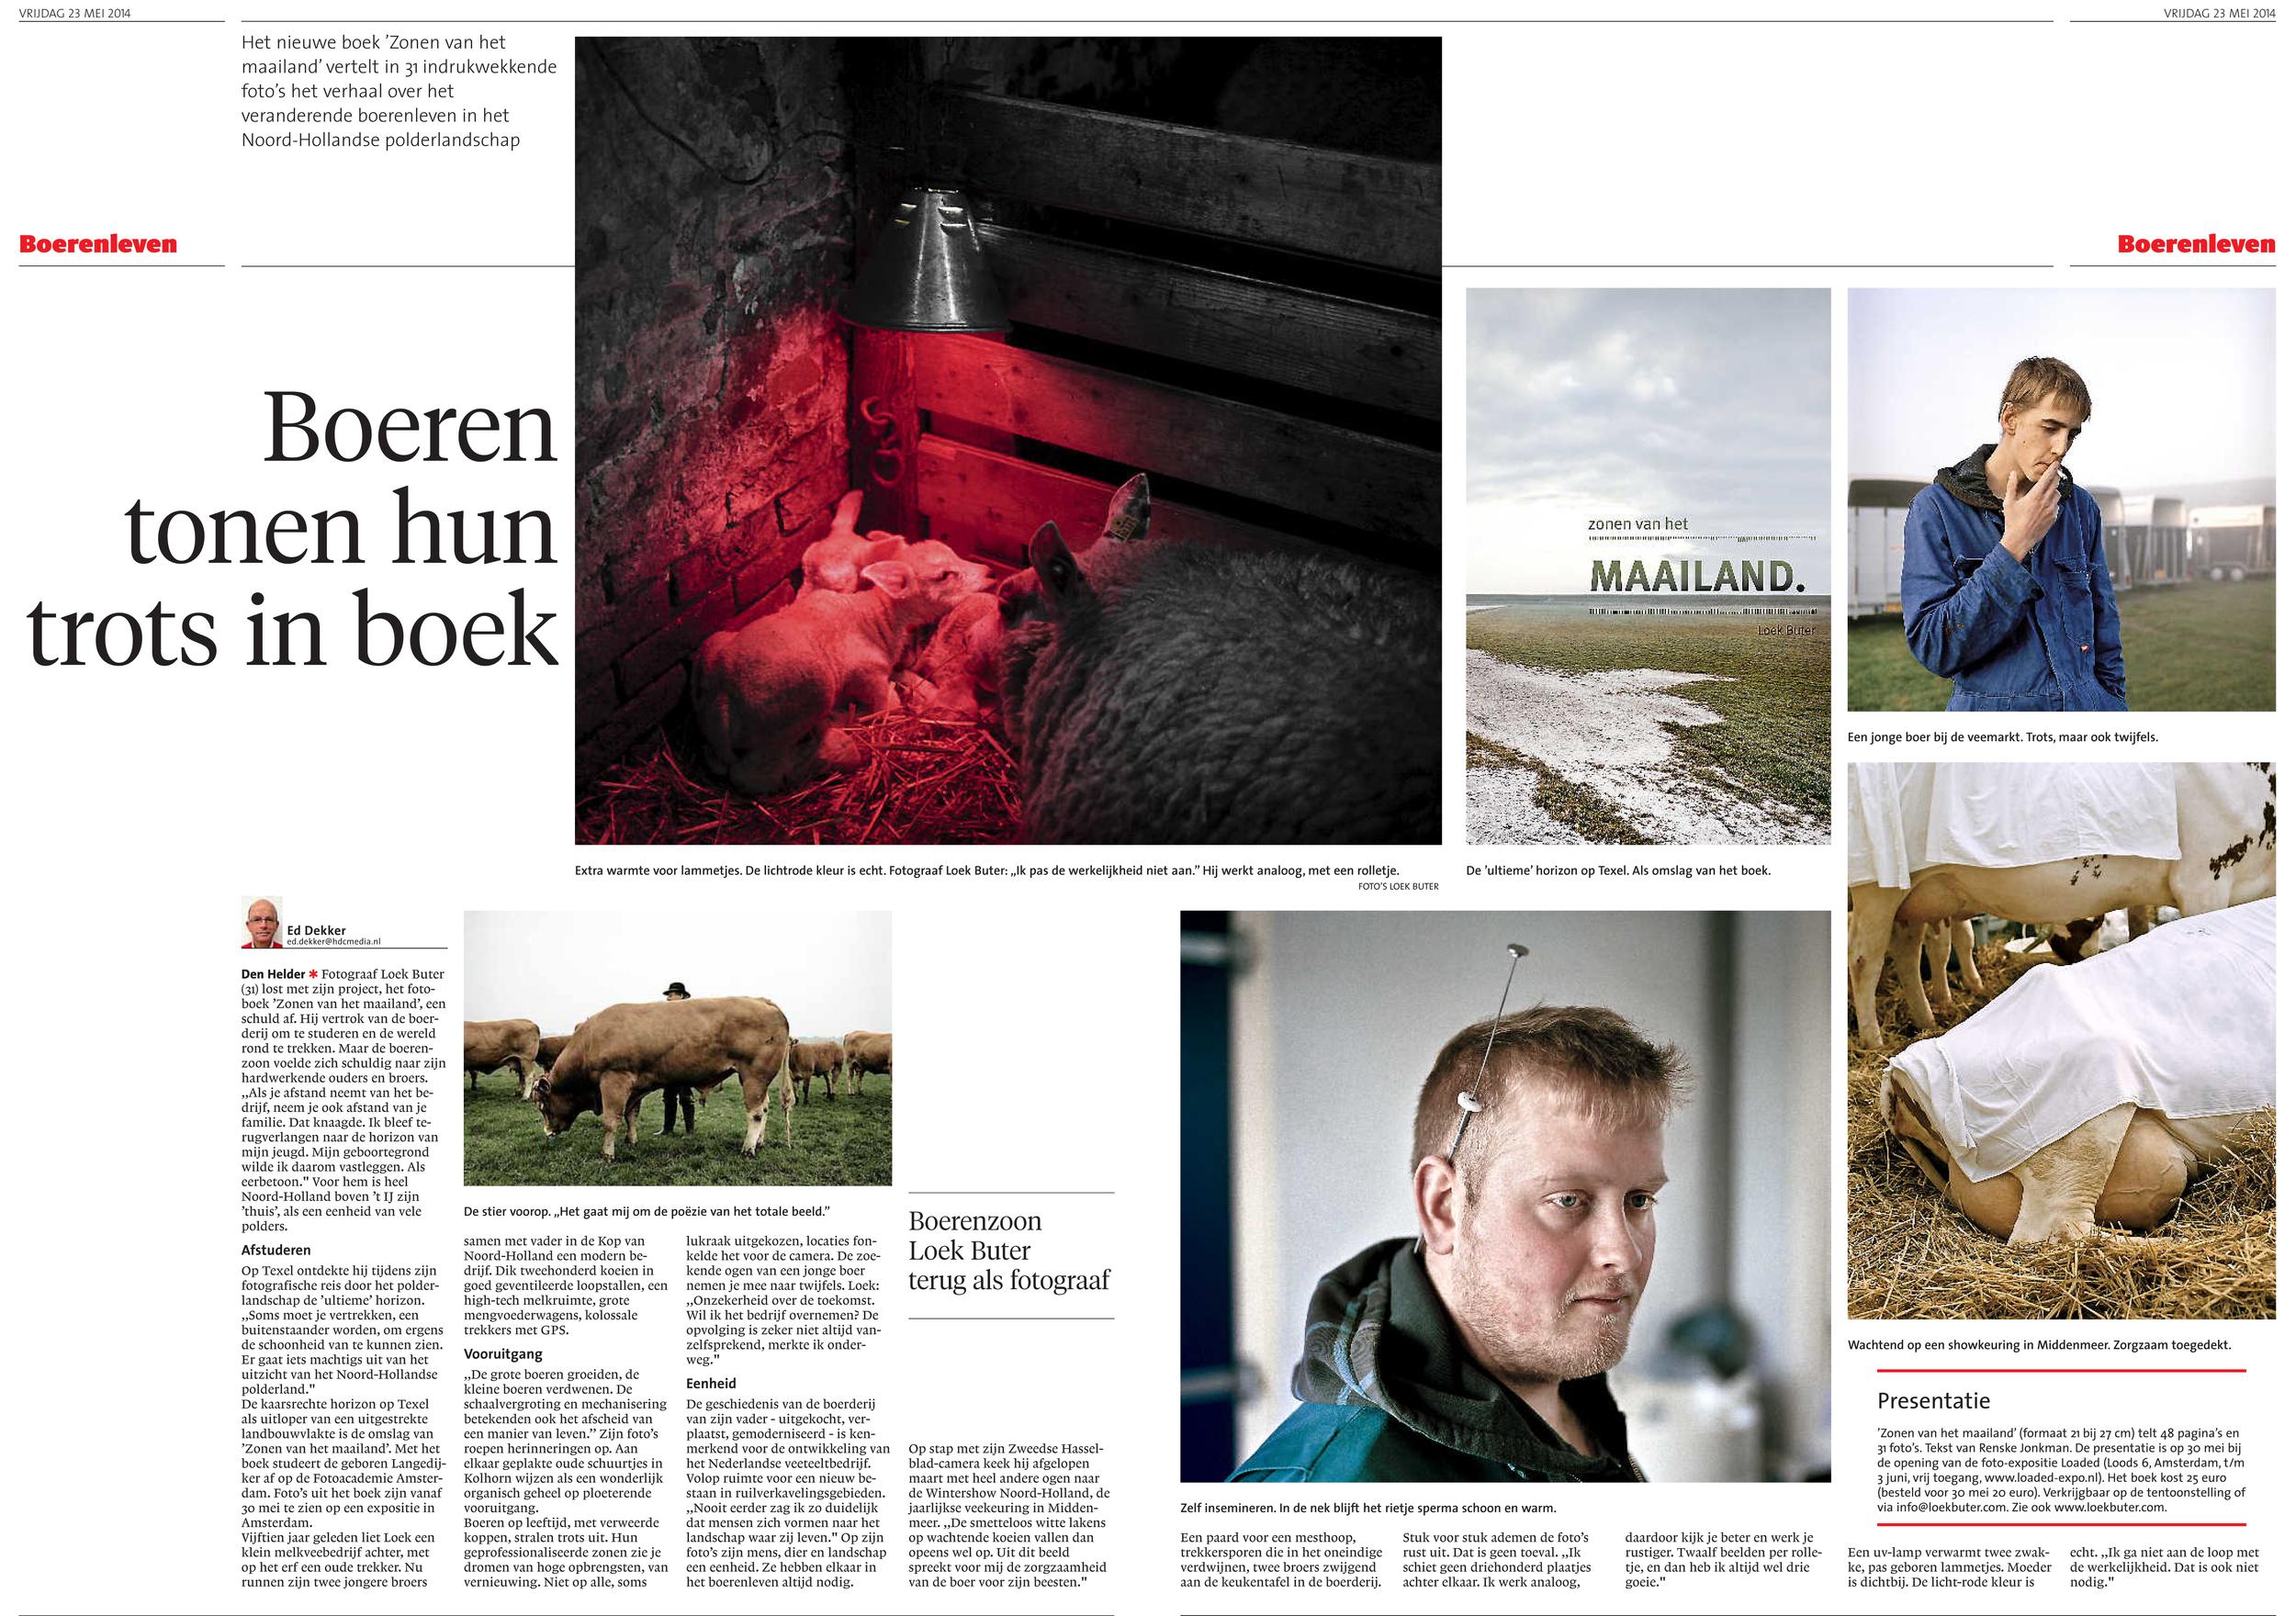 http://www.noordhollandsdagblad.nl/stadstreek/enkhuizen-westfriesland/article27080096.ece/Boeren-tonen-dromen-en-trots-in-fotoboek_